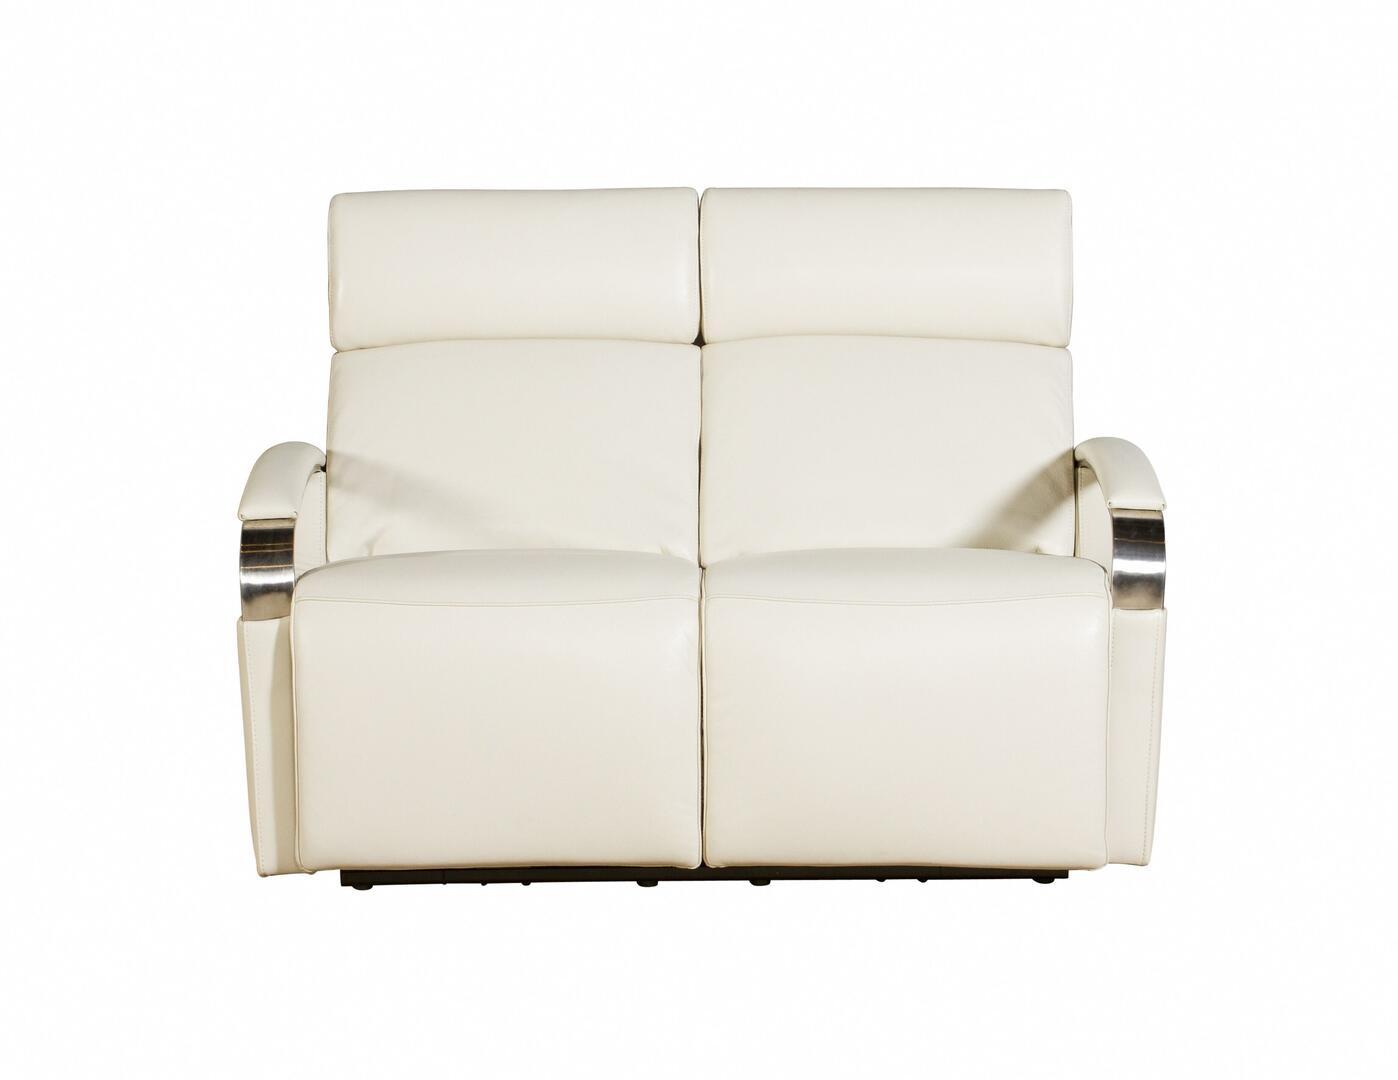 Brilliant Barcalounger 29Ph3089351280 Unemploymentrelief Wooden Chair Designs For Living Room Unemploymentrelieforg